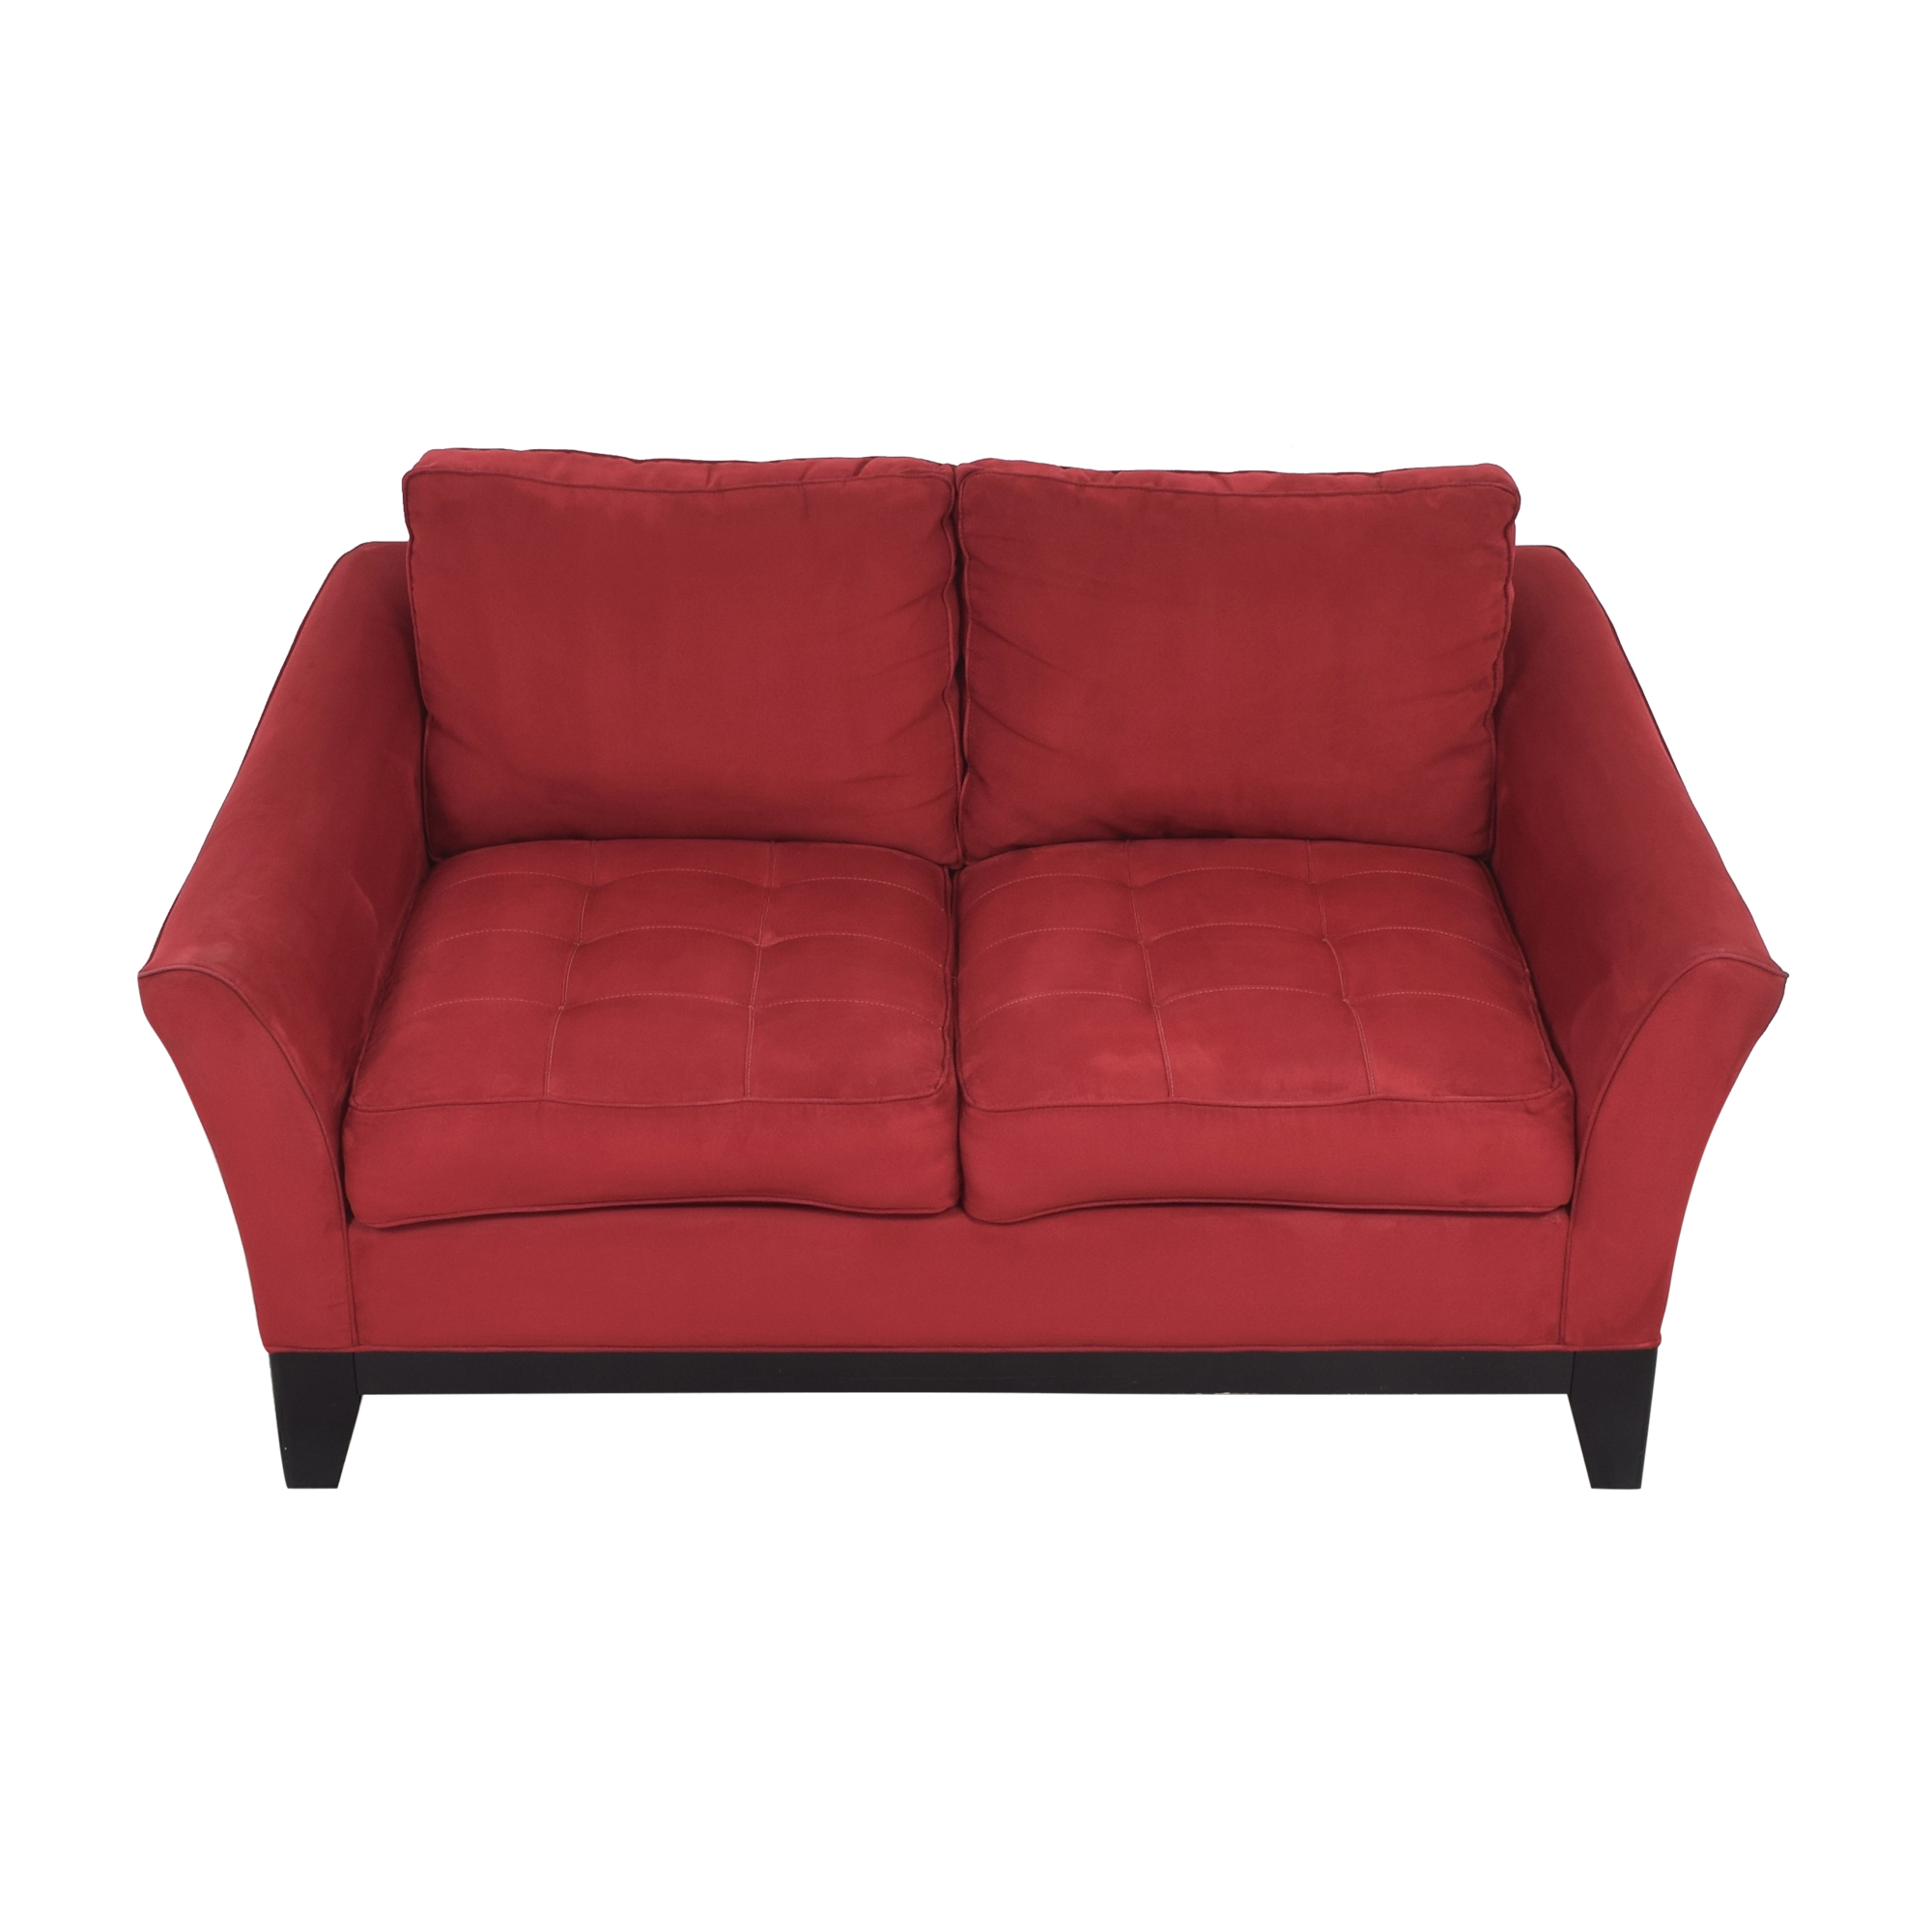 Raymour & Flanigan Raymour & Flanigan Tufted Cushion Loveseat on sale